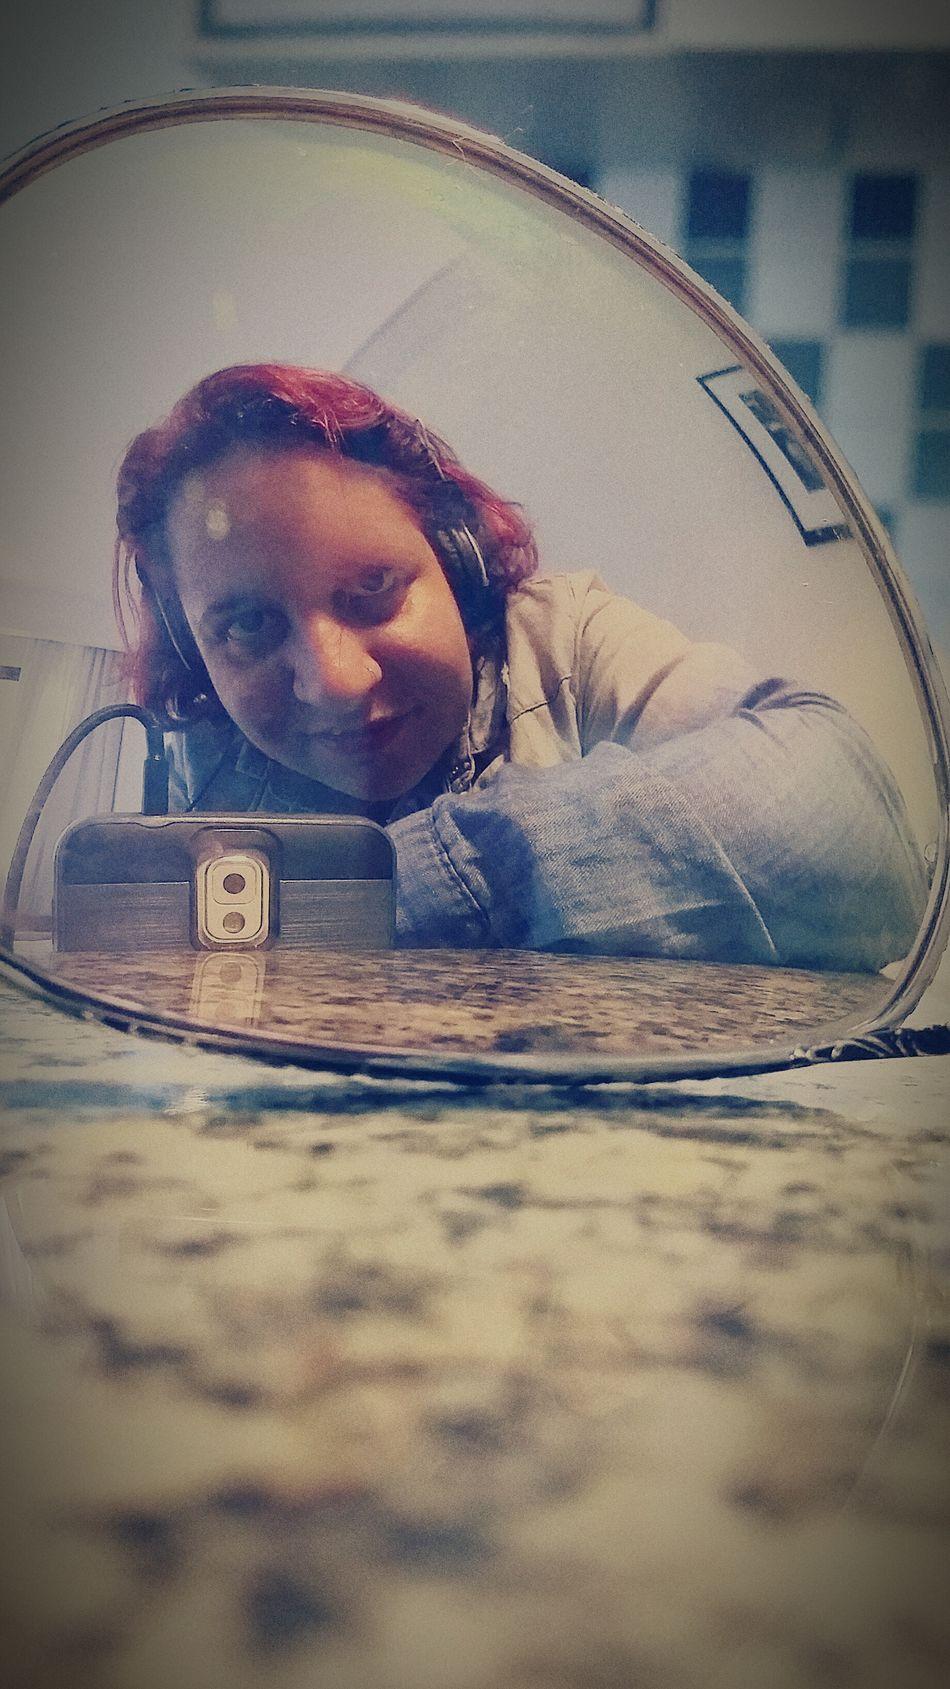 Reflections of myself Selfie Portrait Mirror Picture That's A Sunglass, Btw Curitiba, Brazil